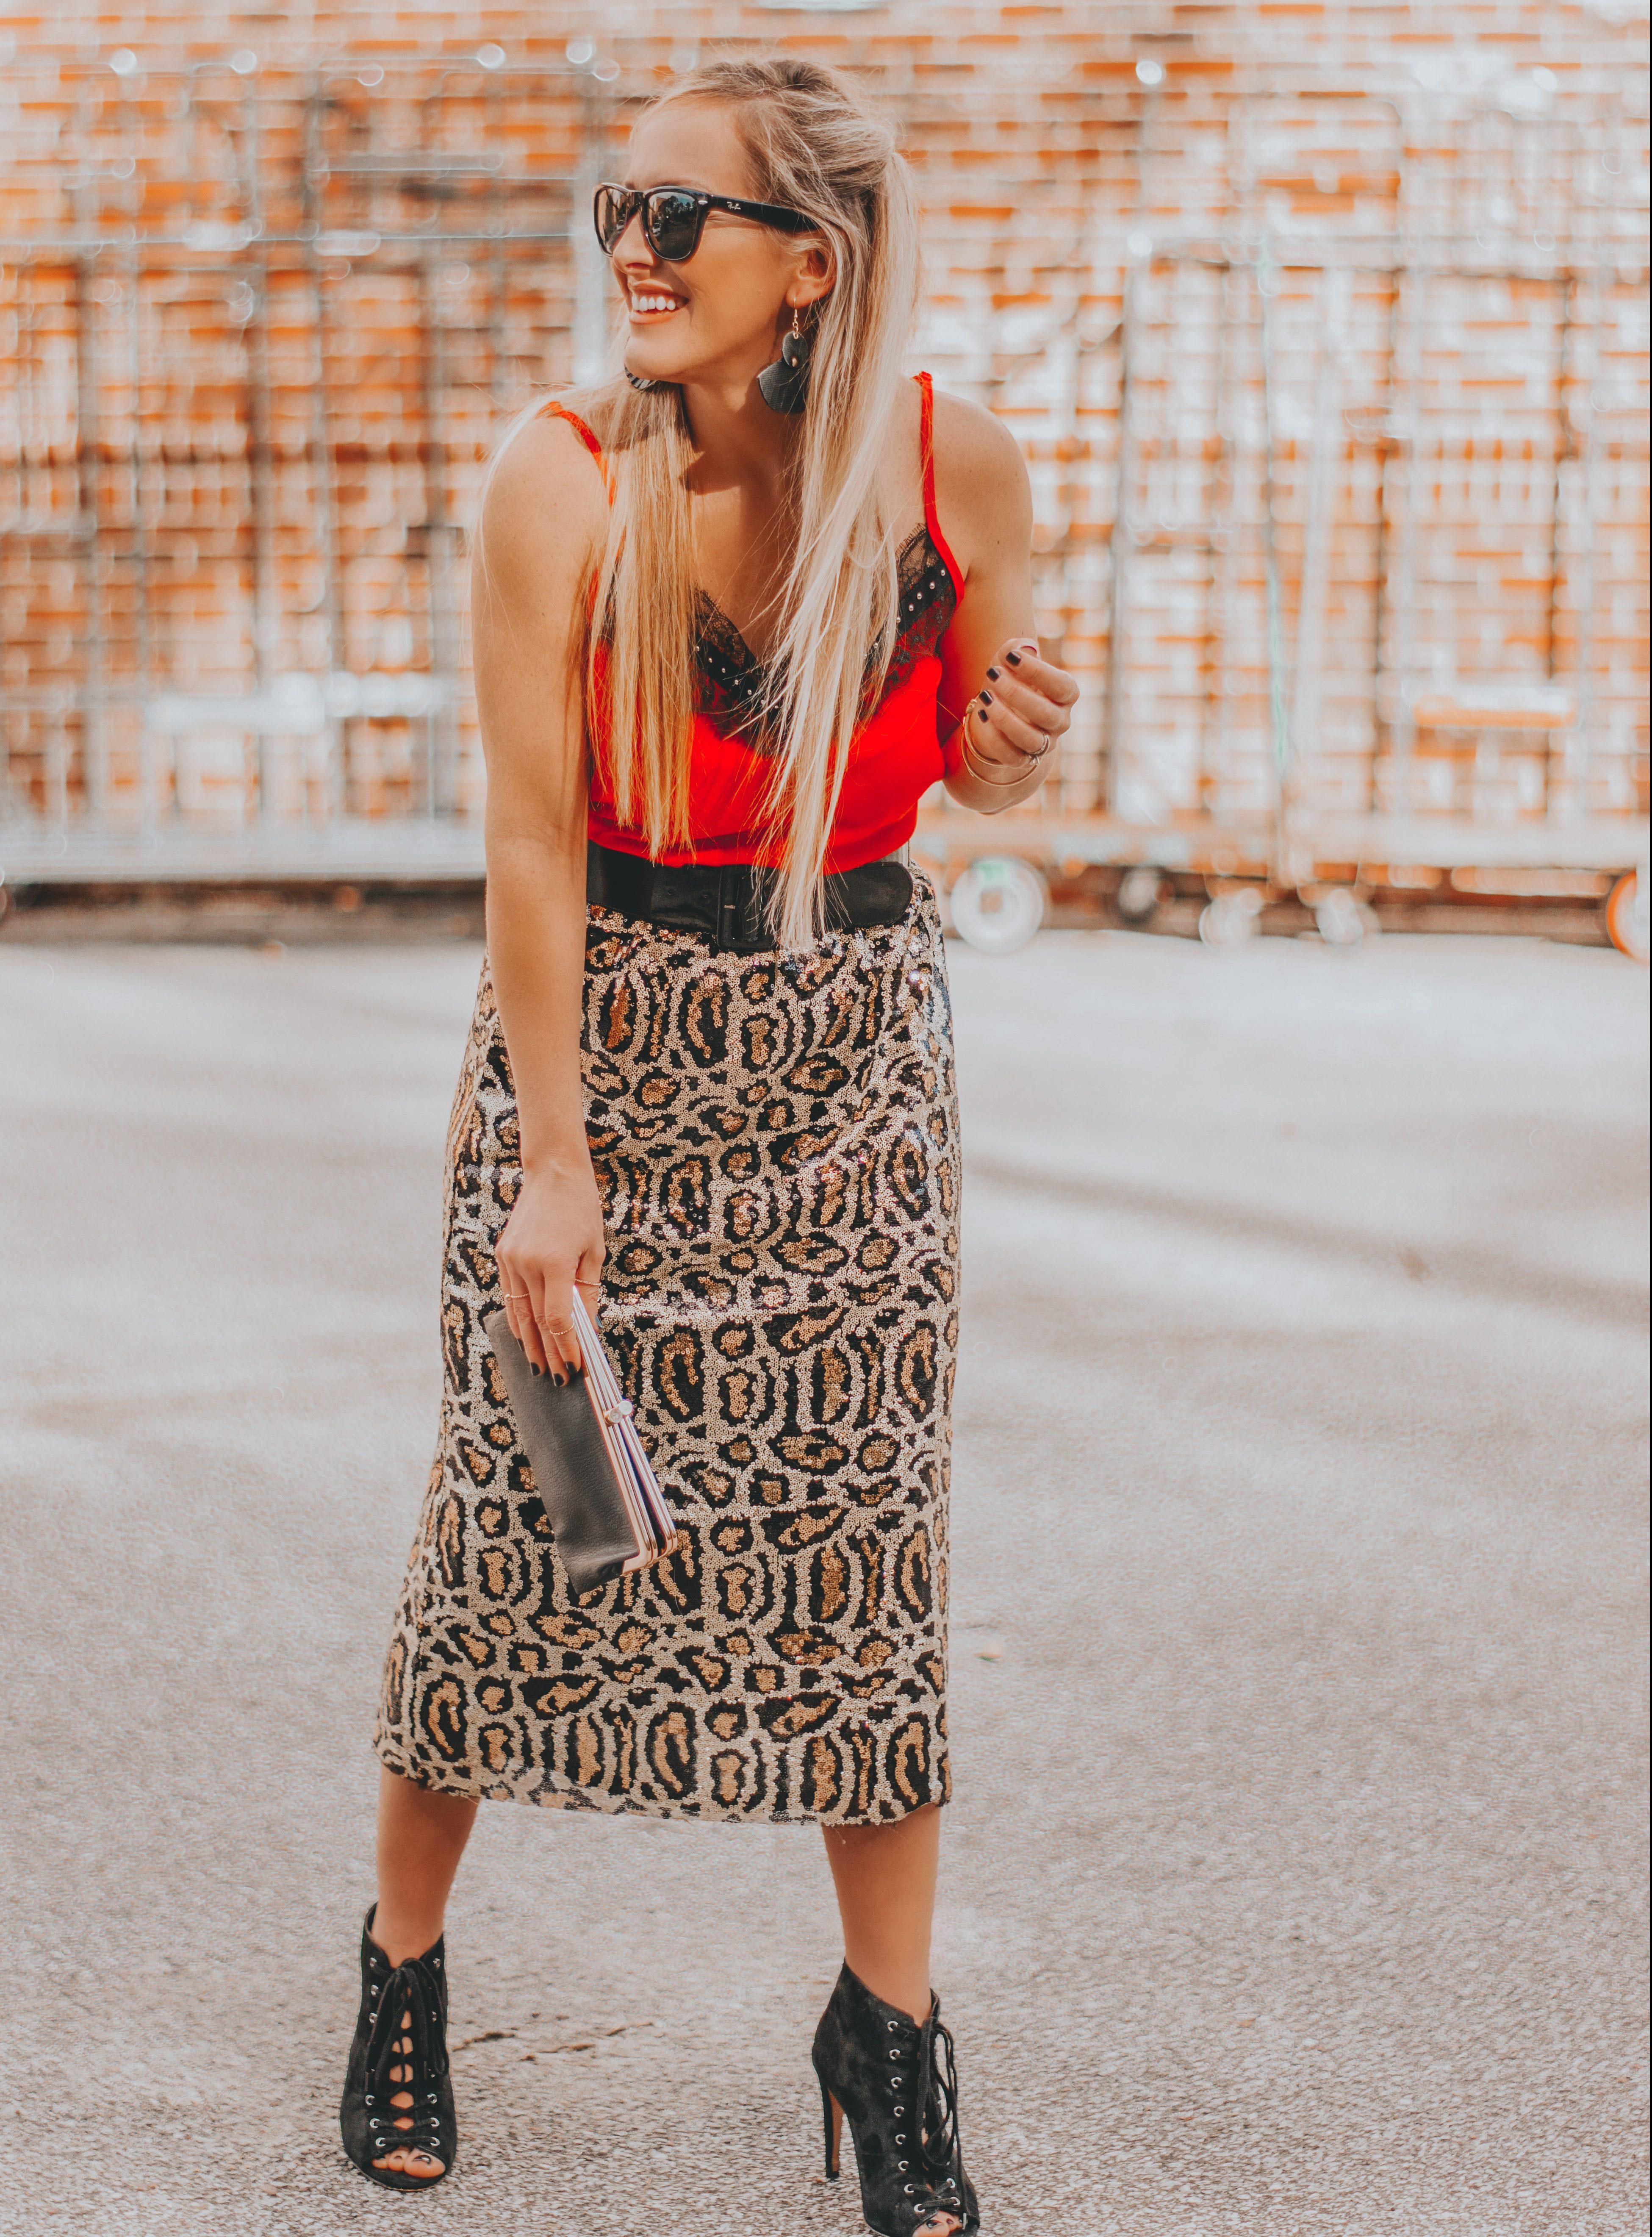 $25 Leopard Sequin Skirt + Budget Friendly Valentine's Outfit Inspo   BreeAtLast.com